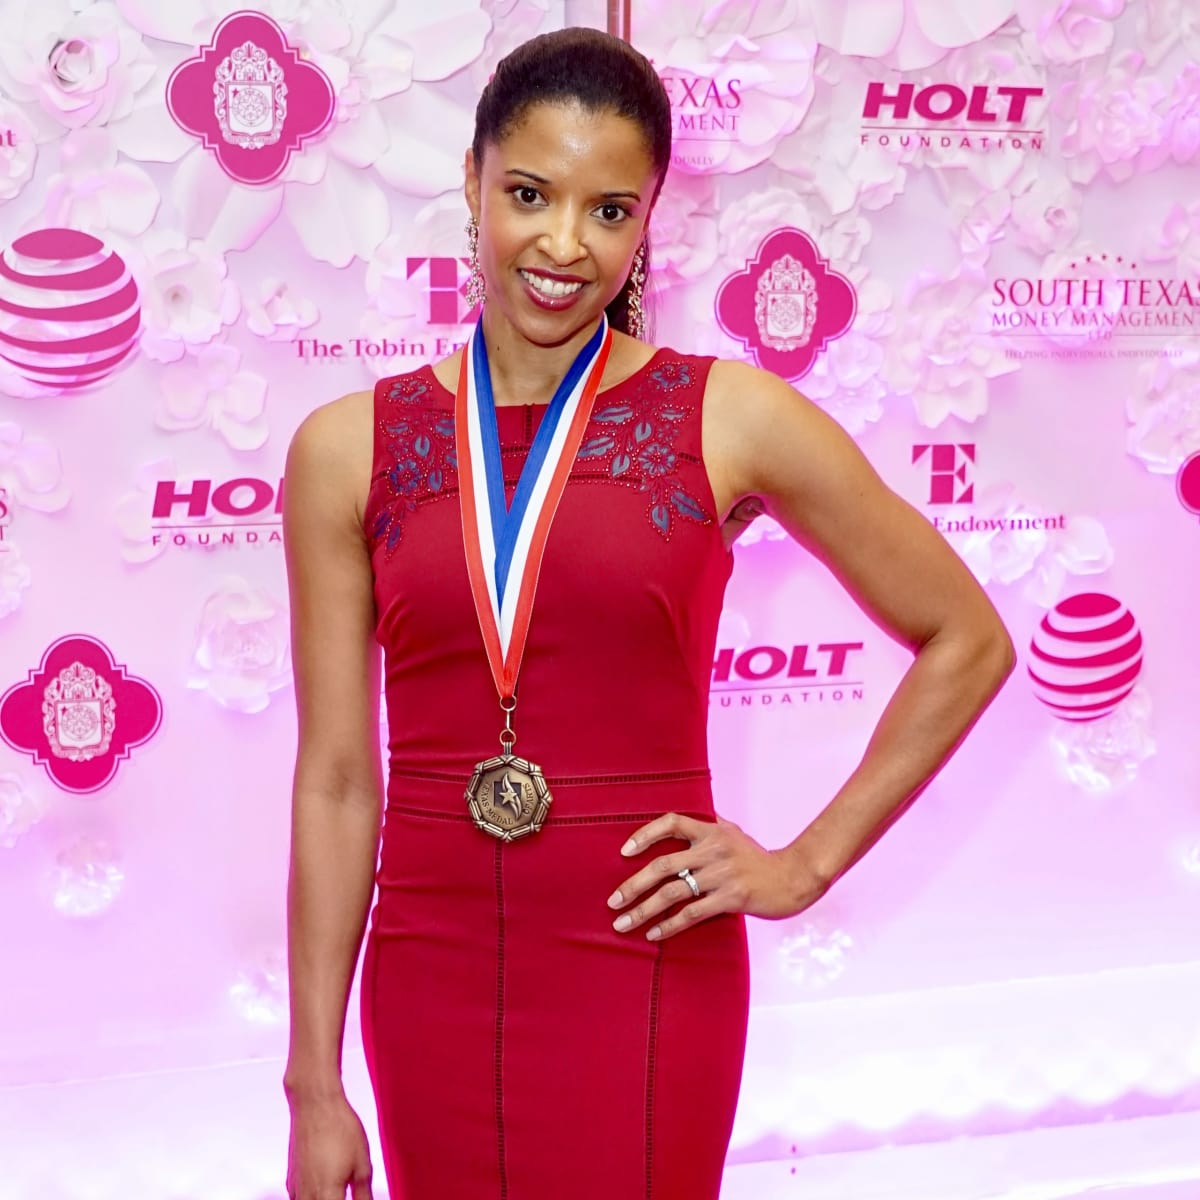 Texas Medal of Arts Awards Renee Elise Goldsberry